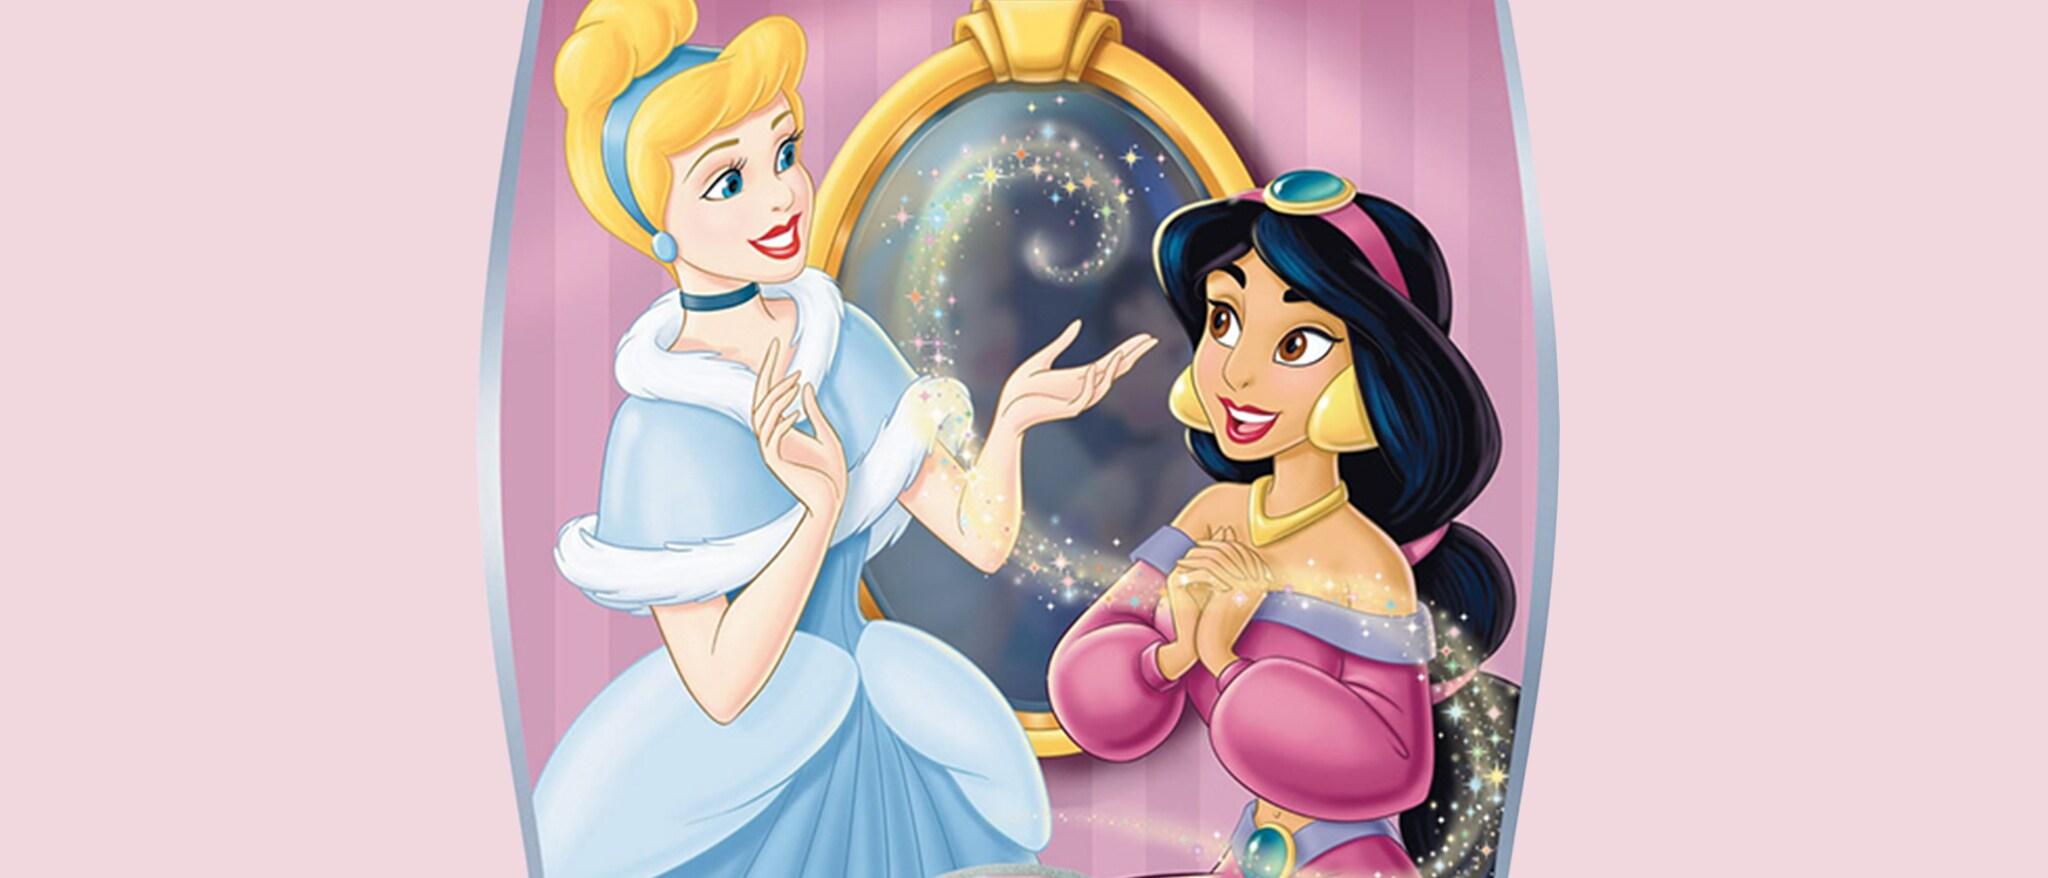 Disney Princess Stories Volume Three: Beauty Shines from Within Hero